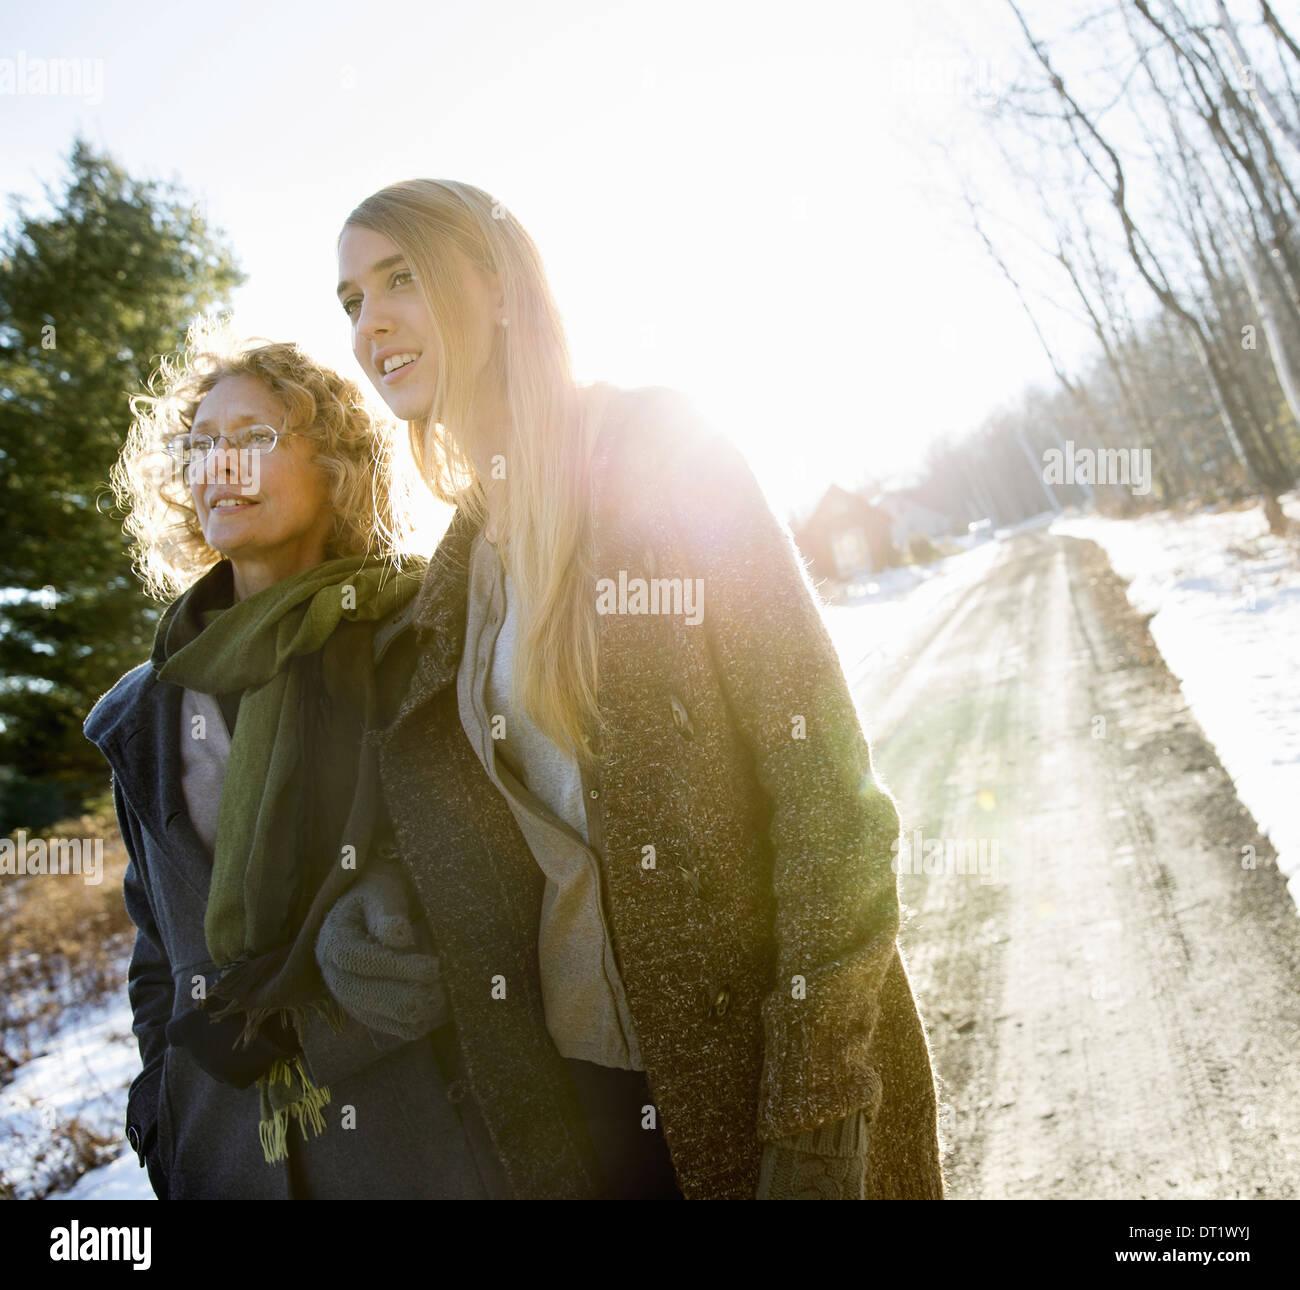 Madre e hija de invierno al aire libre Imagen De Stock